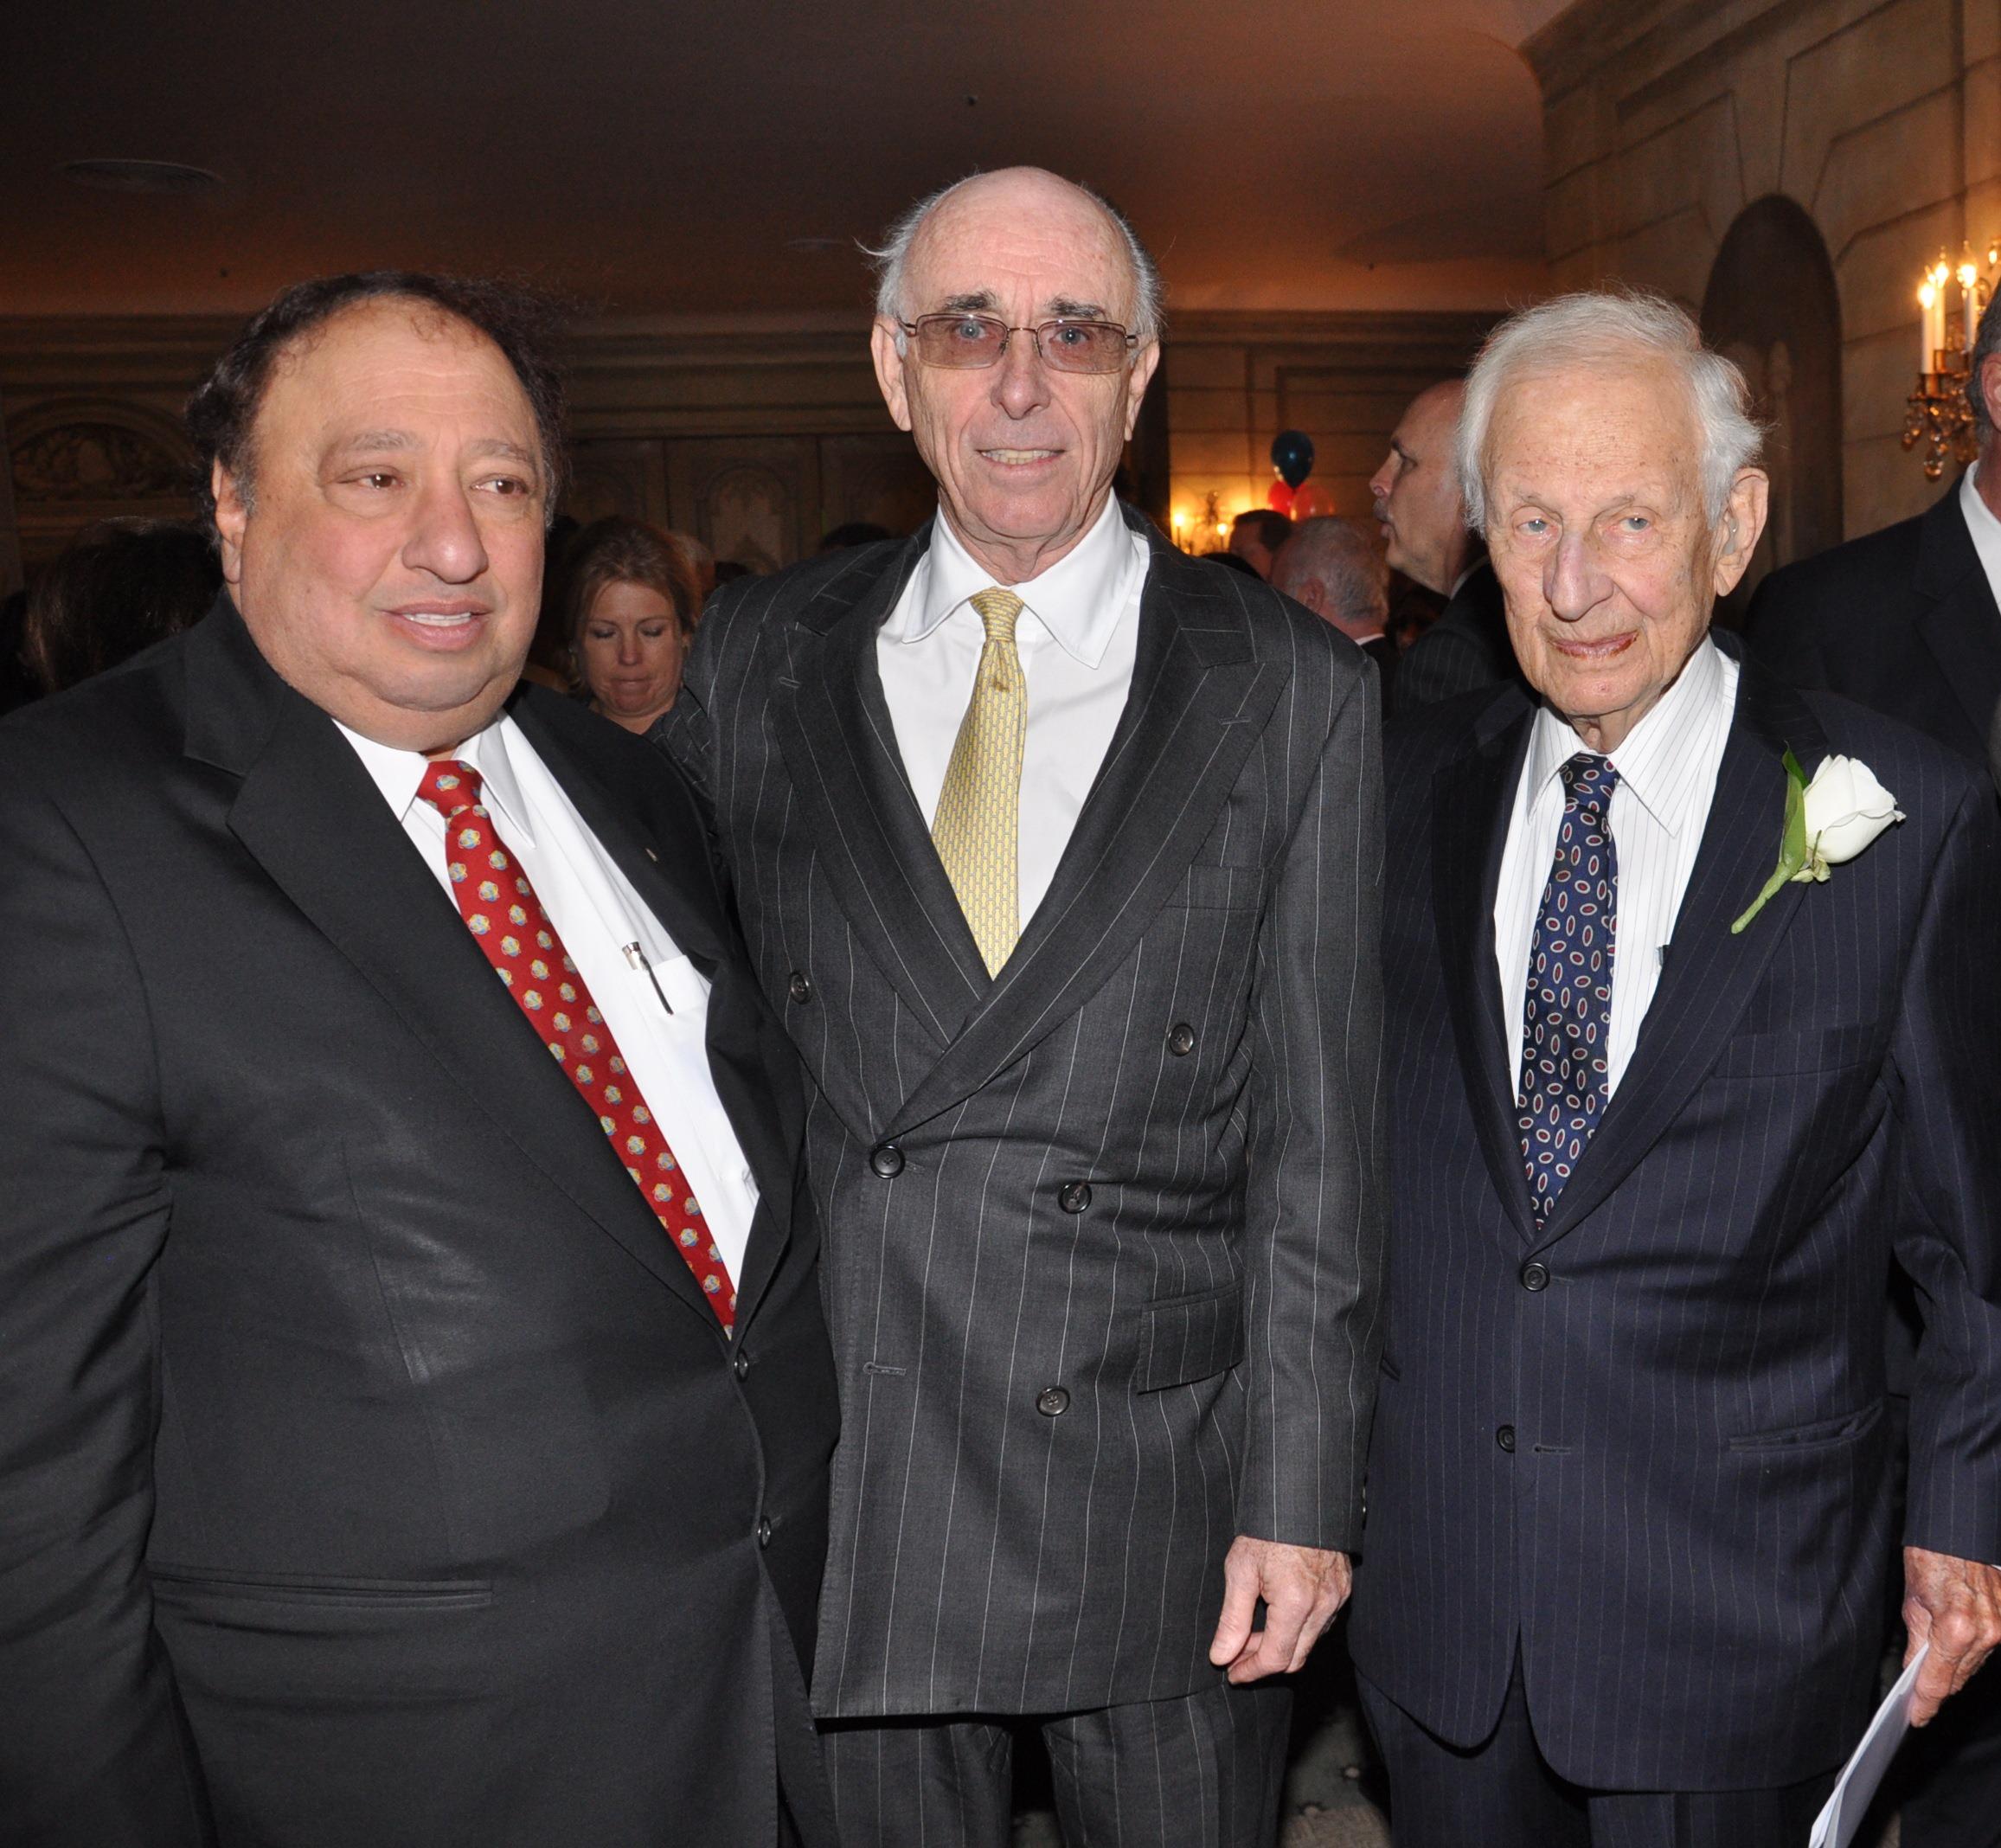 John A. Catsimatidis, Robert J. McGuire, Robert M. Morgenthau.JPG